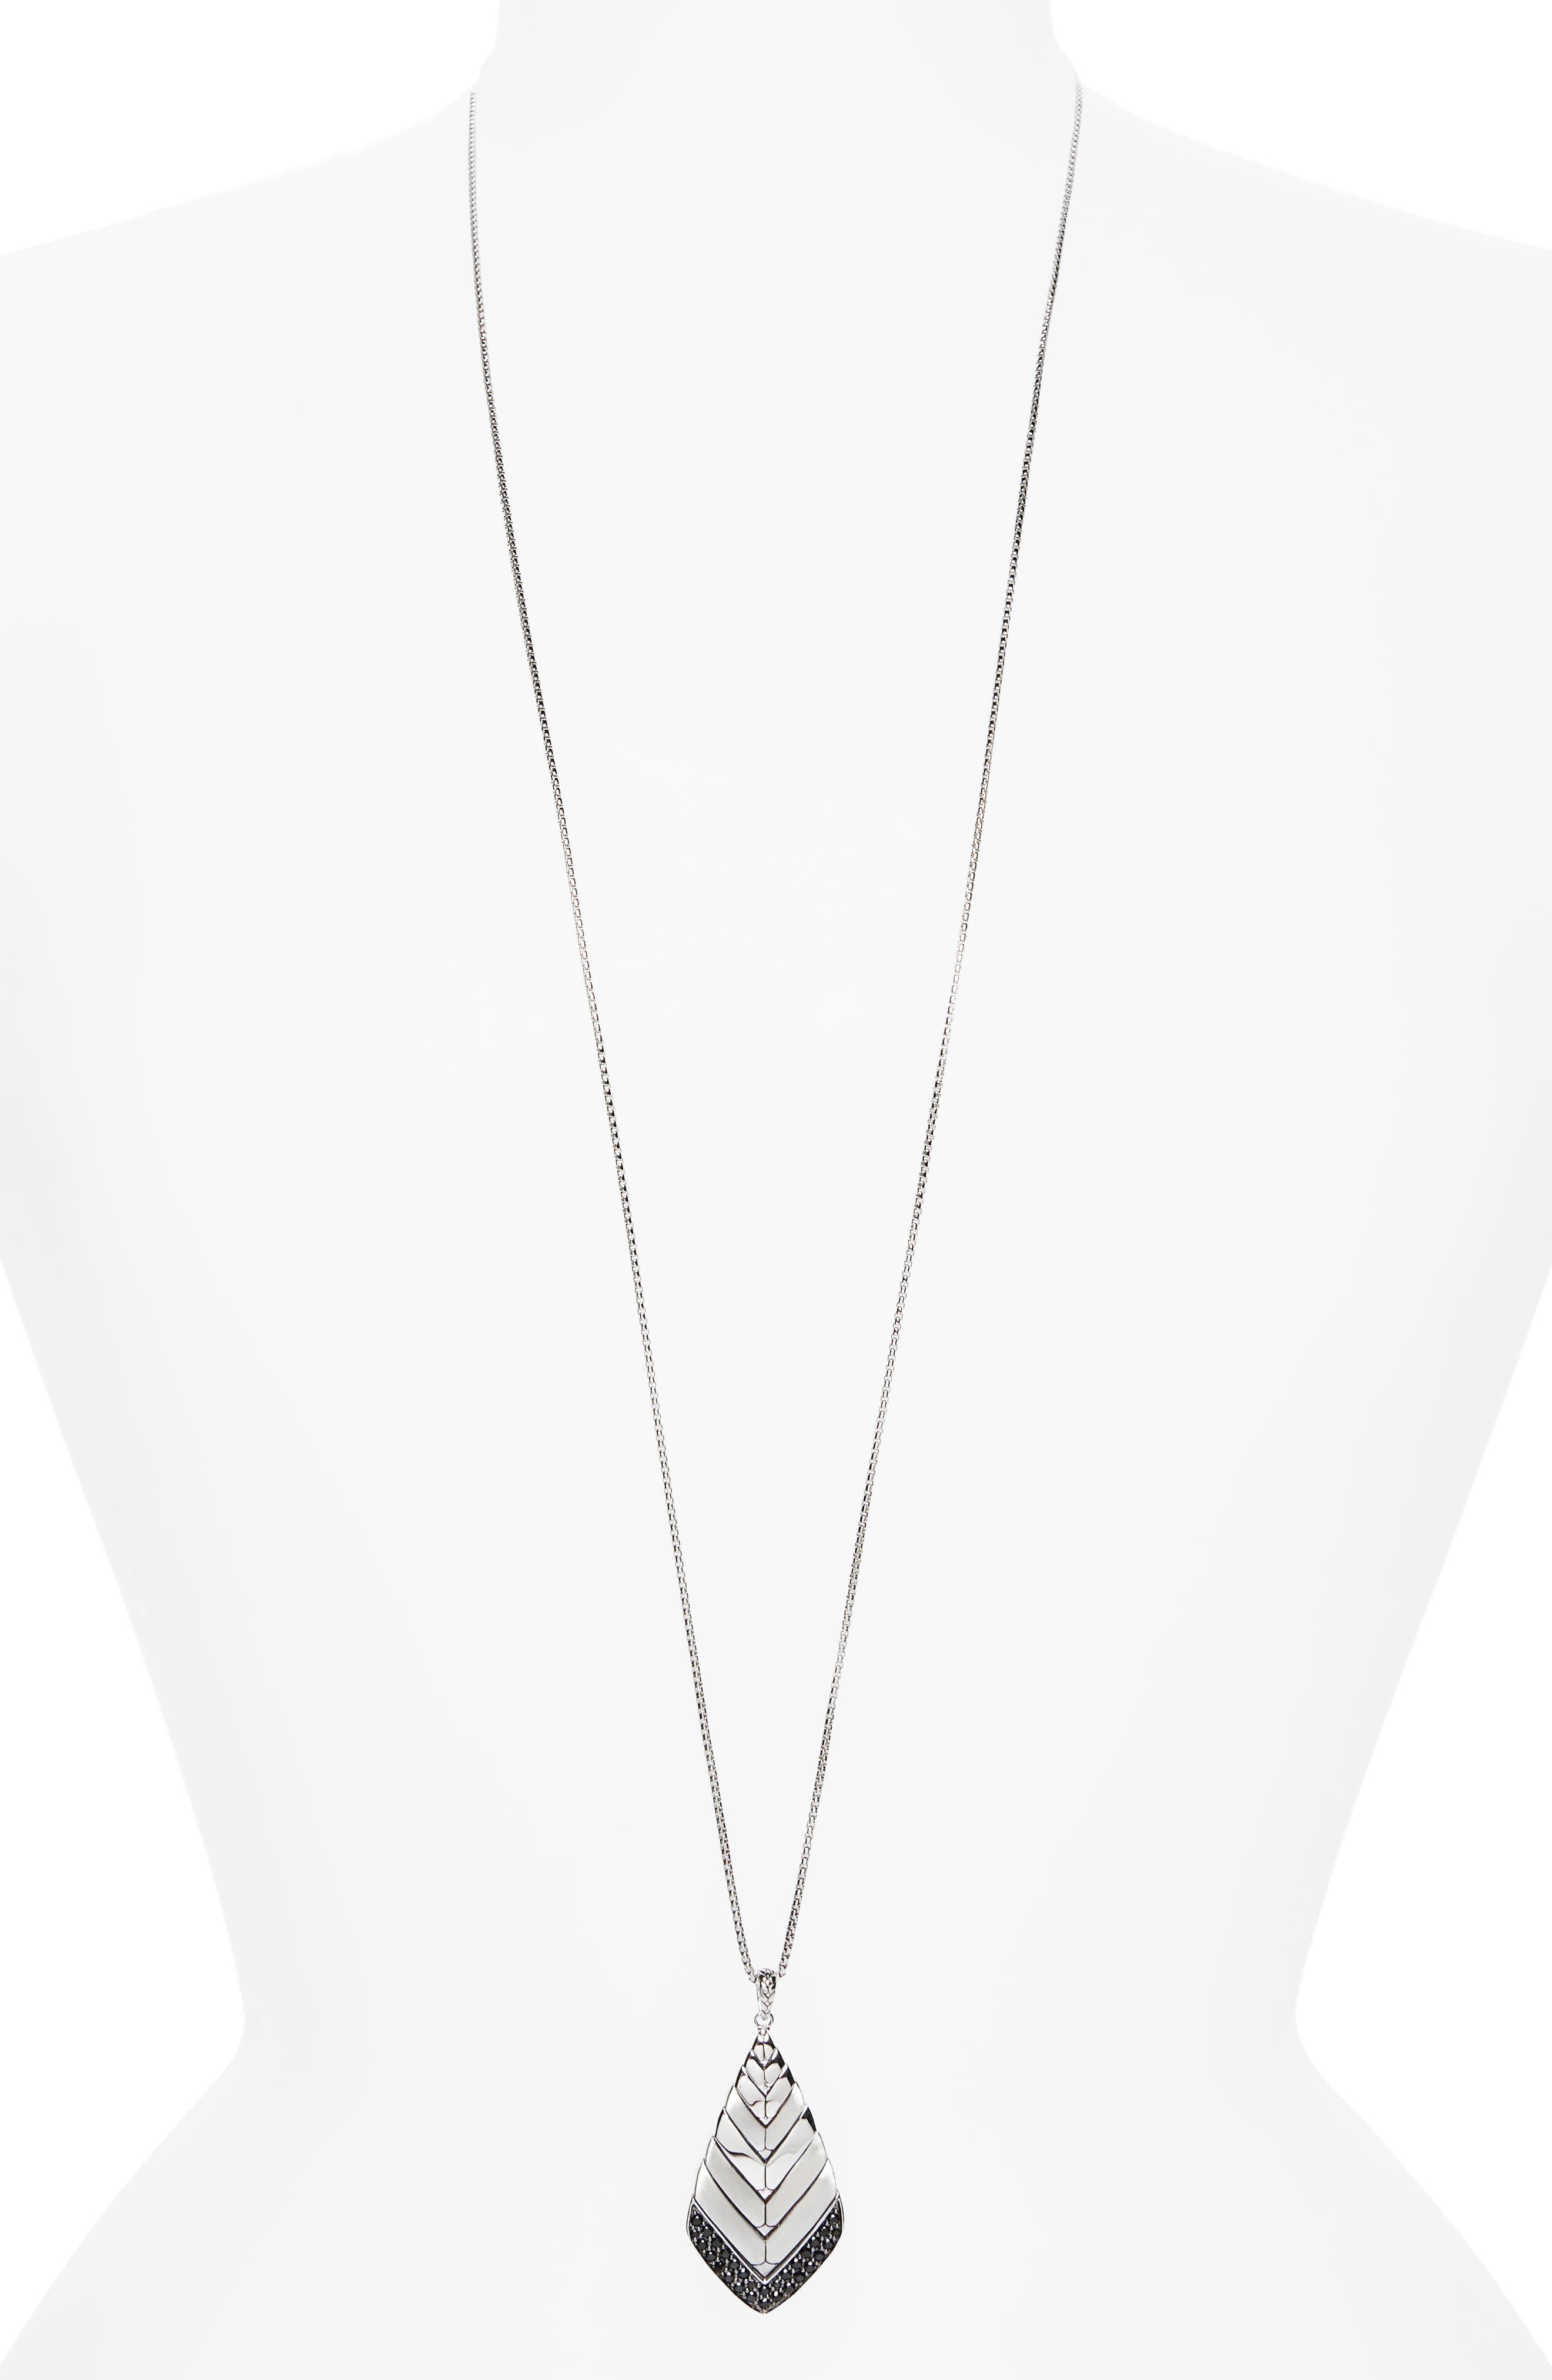 Main Image - John Hardy Modern Chain Pendant Necklace